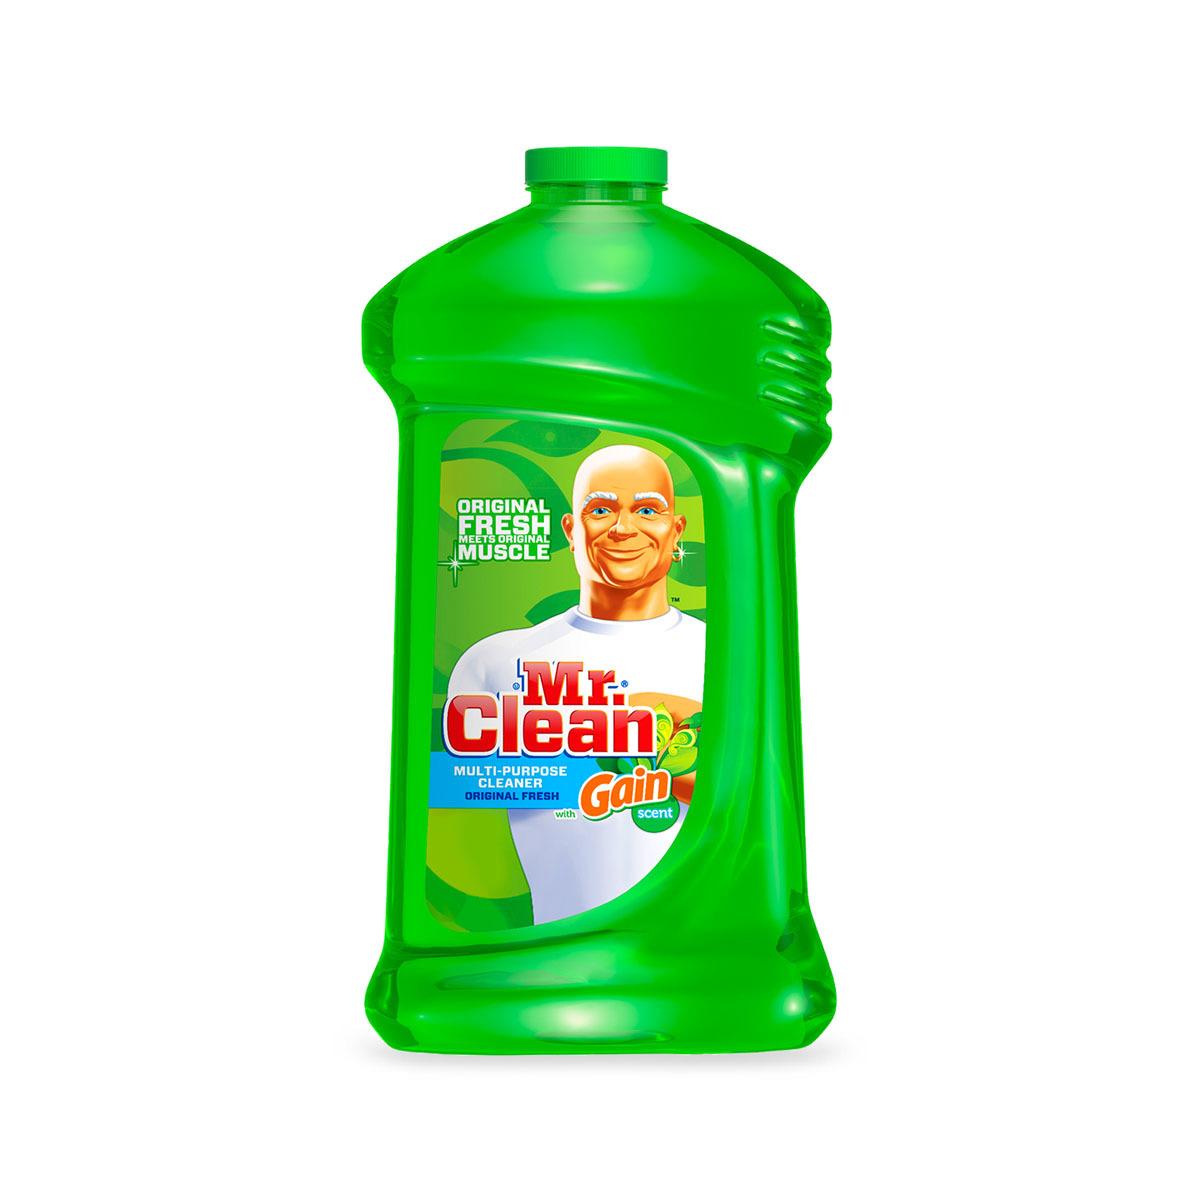 mr clean with gain original scent multi purpose cleaner